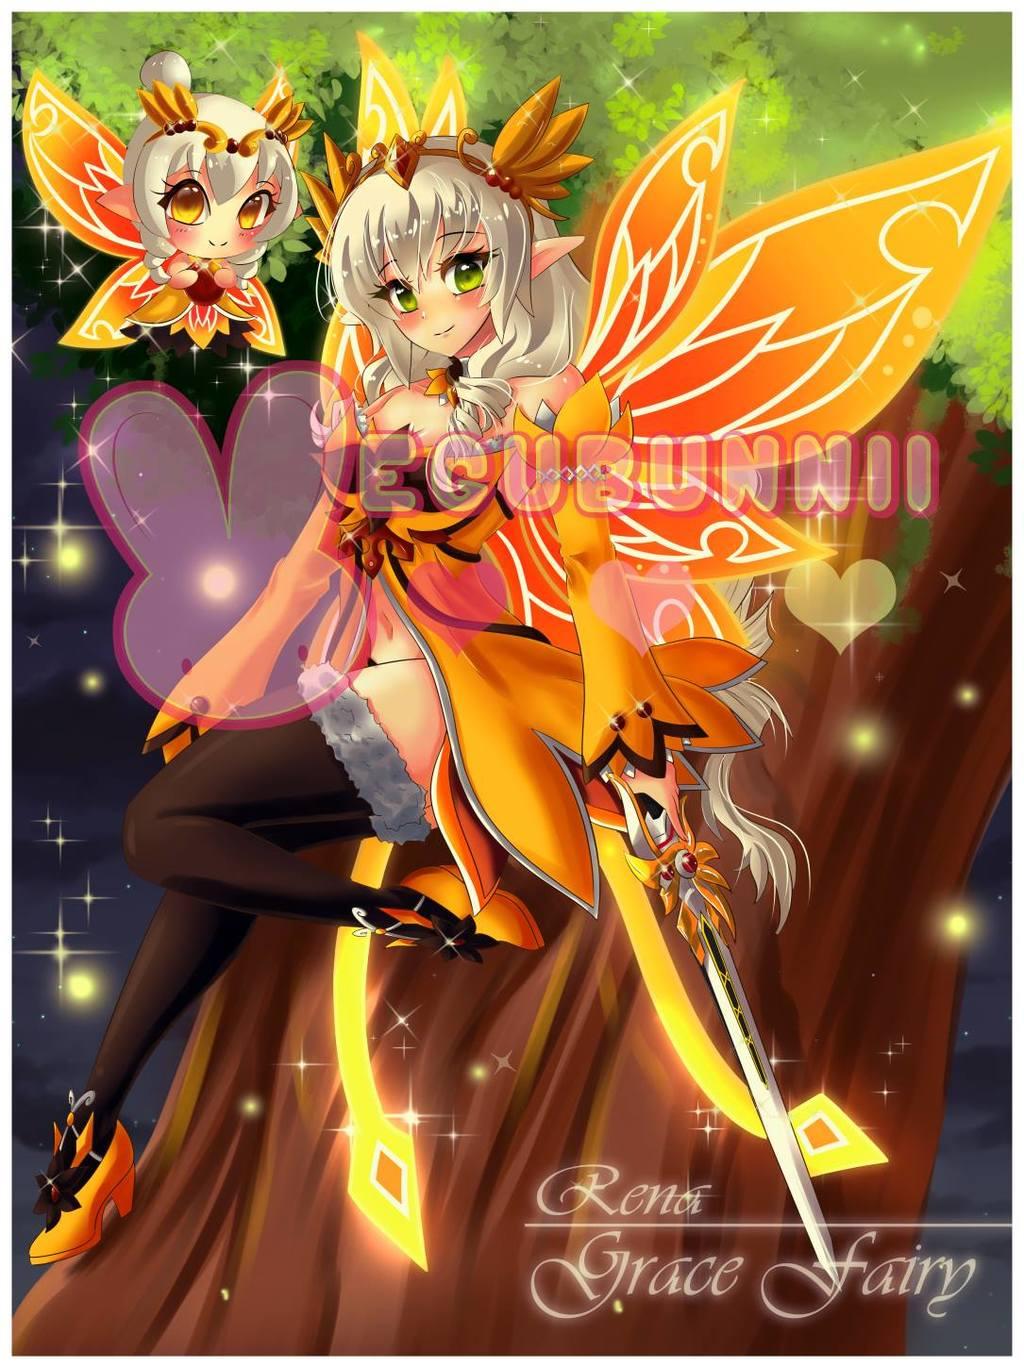 Most recent image: :Elsword: Rena Grace Fairy